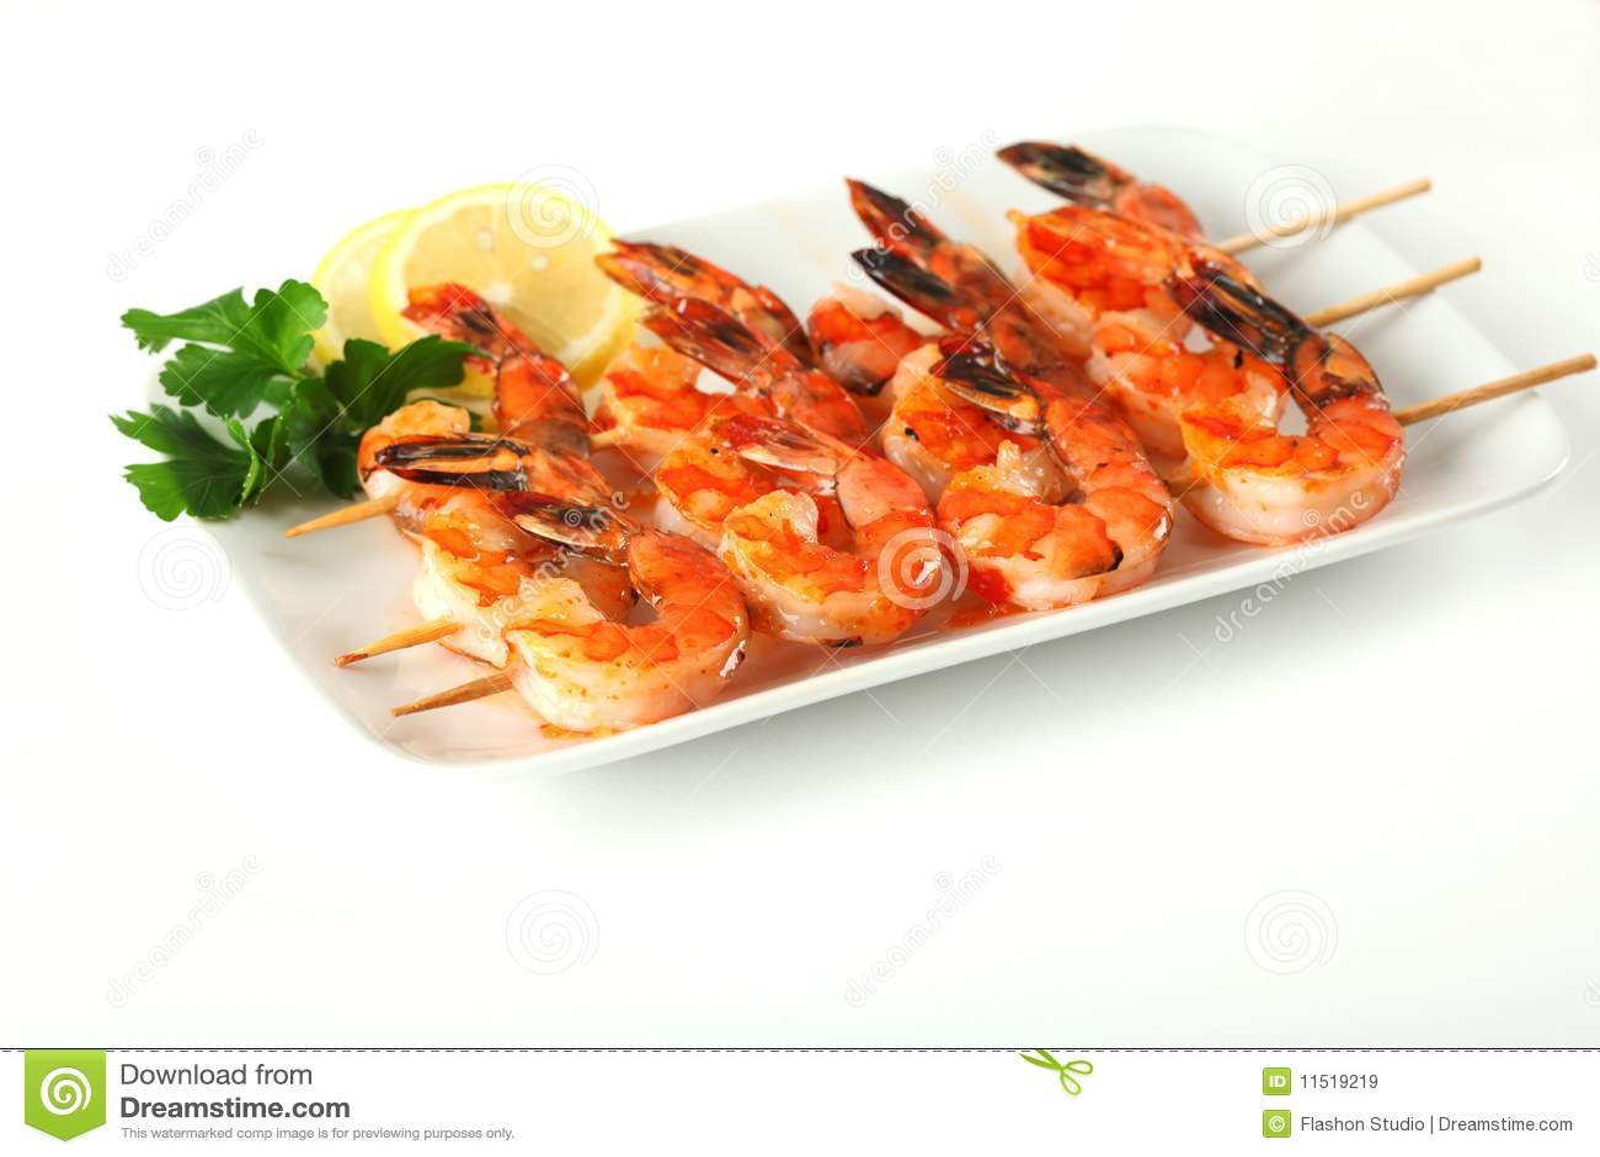 Shrimp skewers with sweet garlic chili sauce